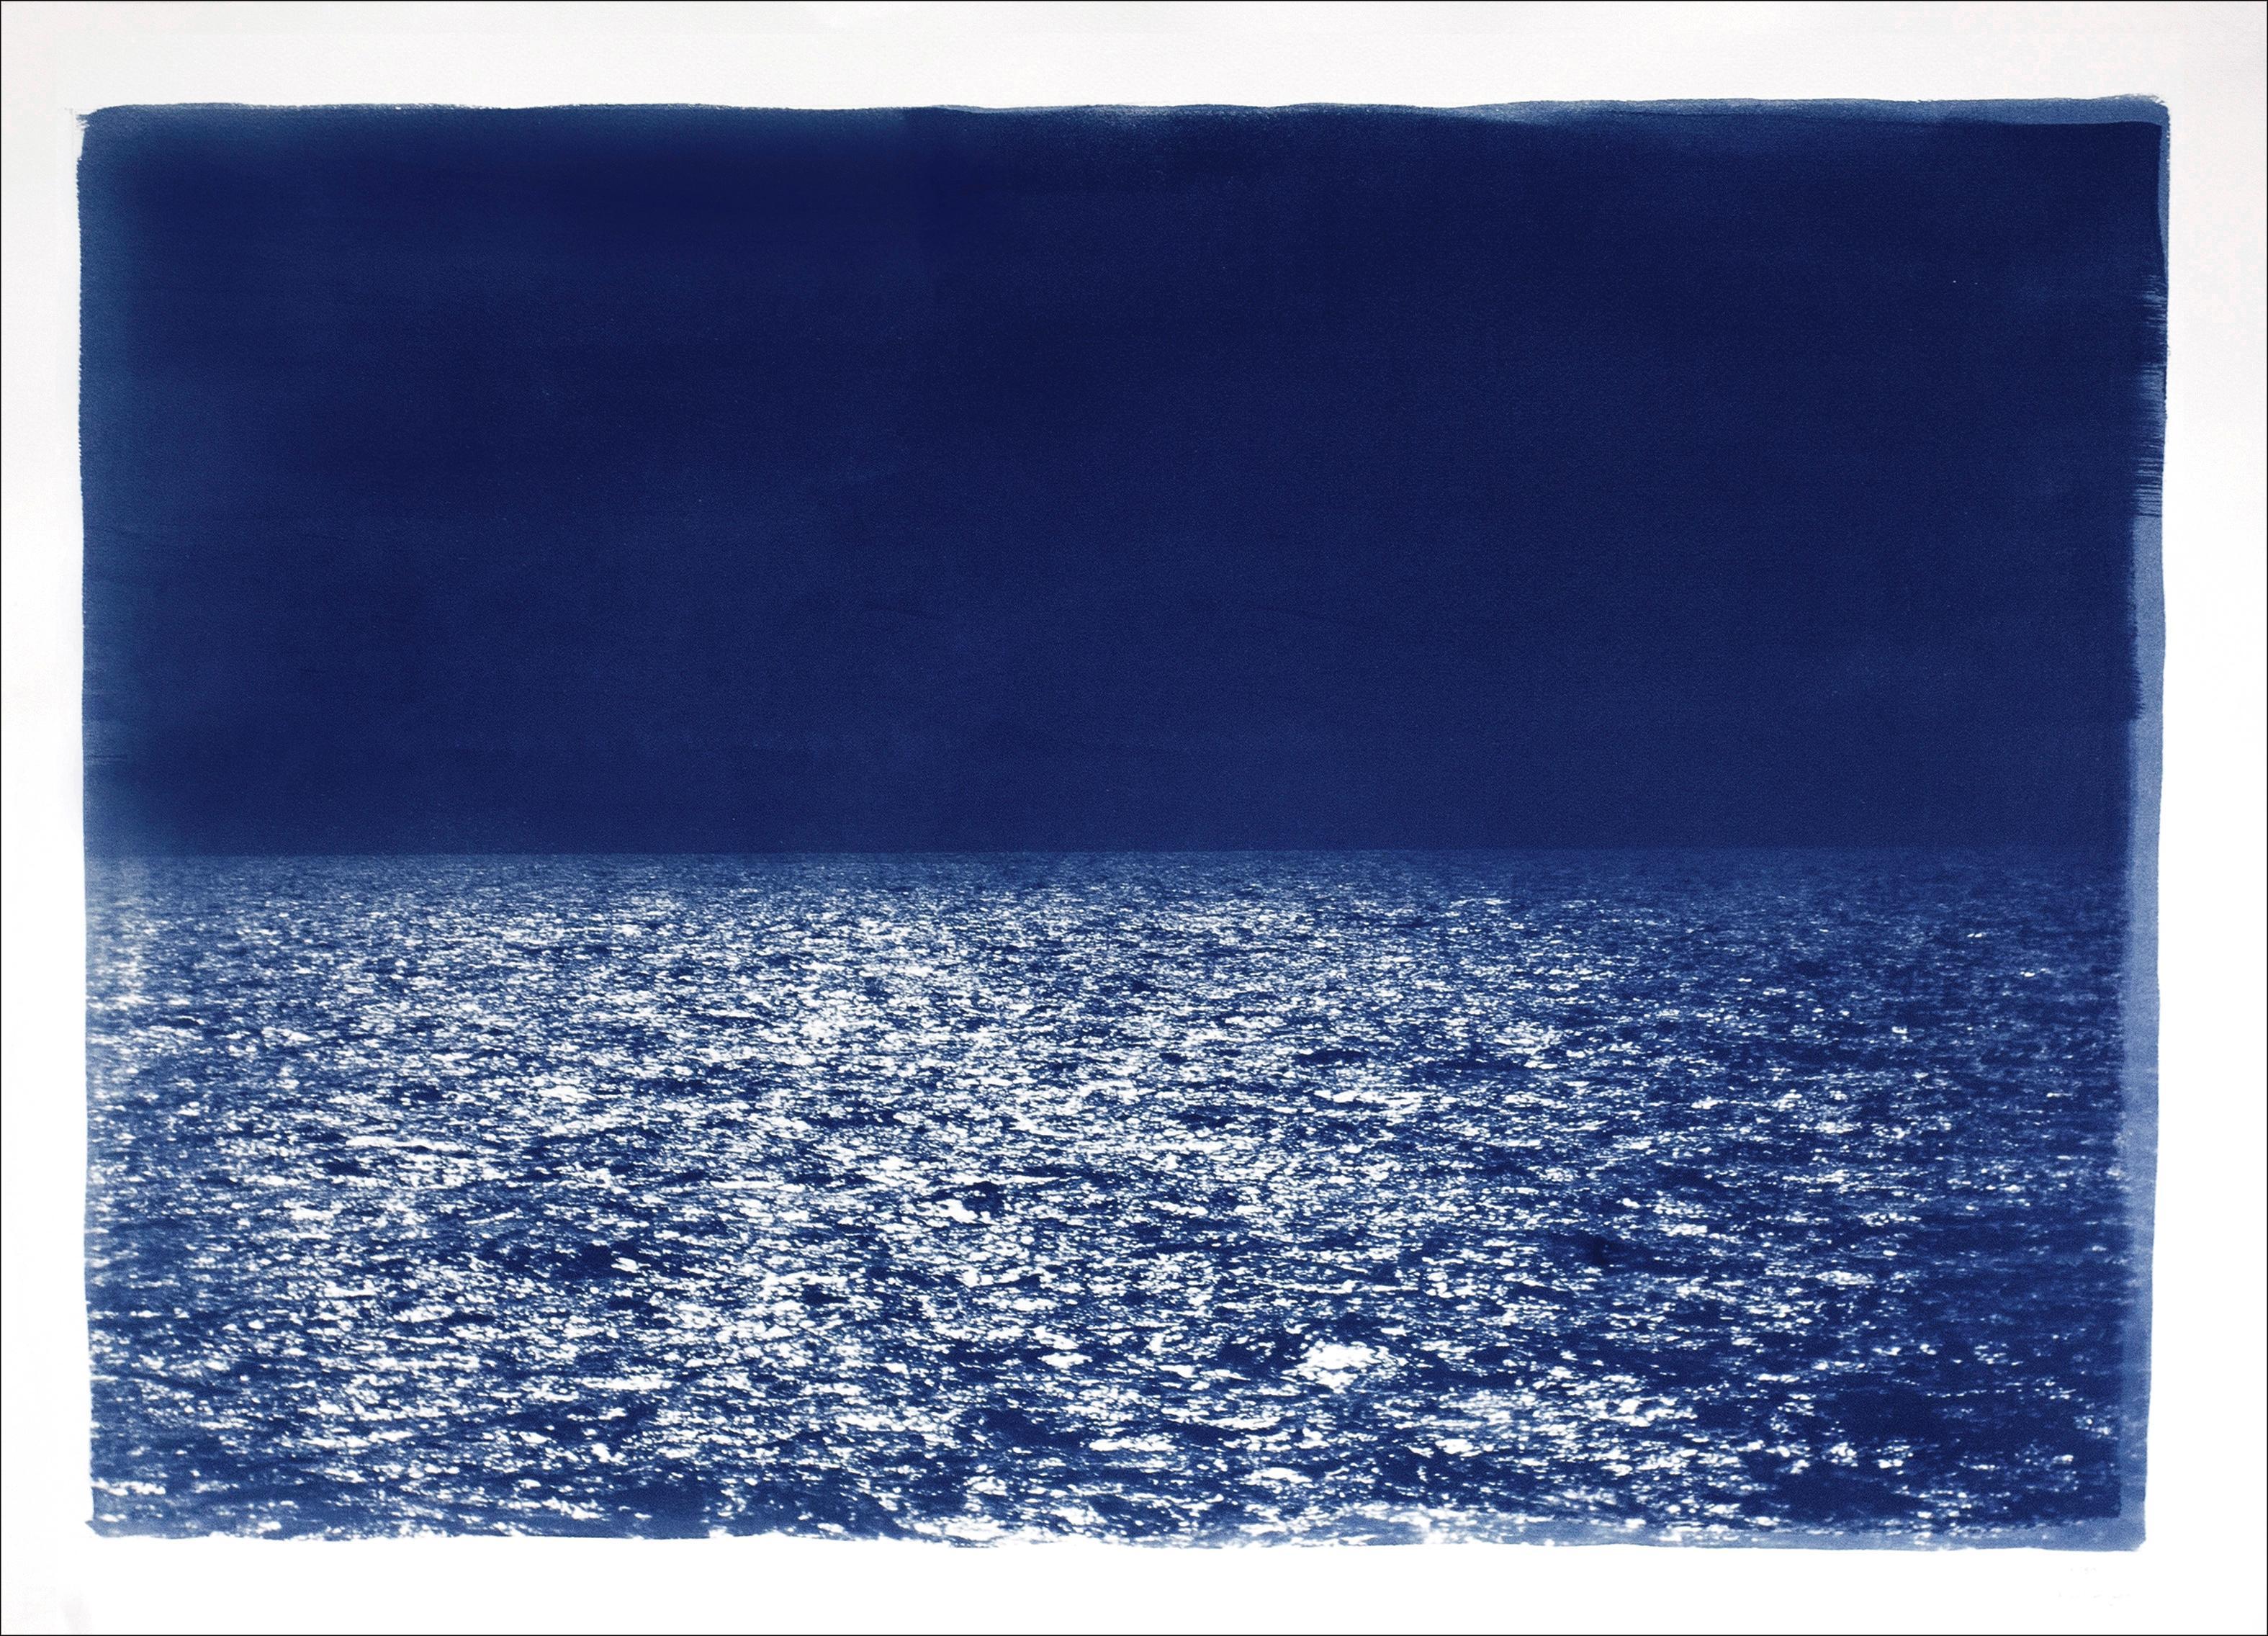 Barcelona Beach Night Horizon, Nocturnal Seascape Cyanotype on Watercolor Paper